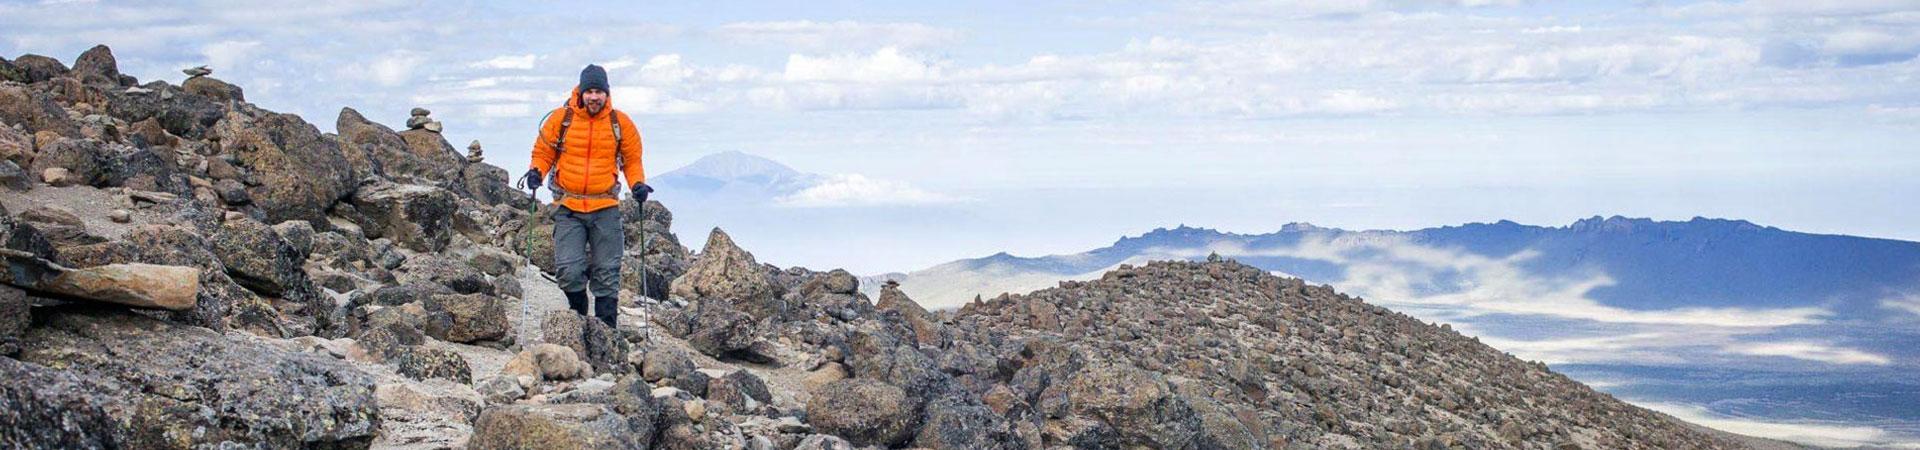 Climbing-Mount-Kilimanjaro-Rongai-Route.